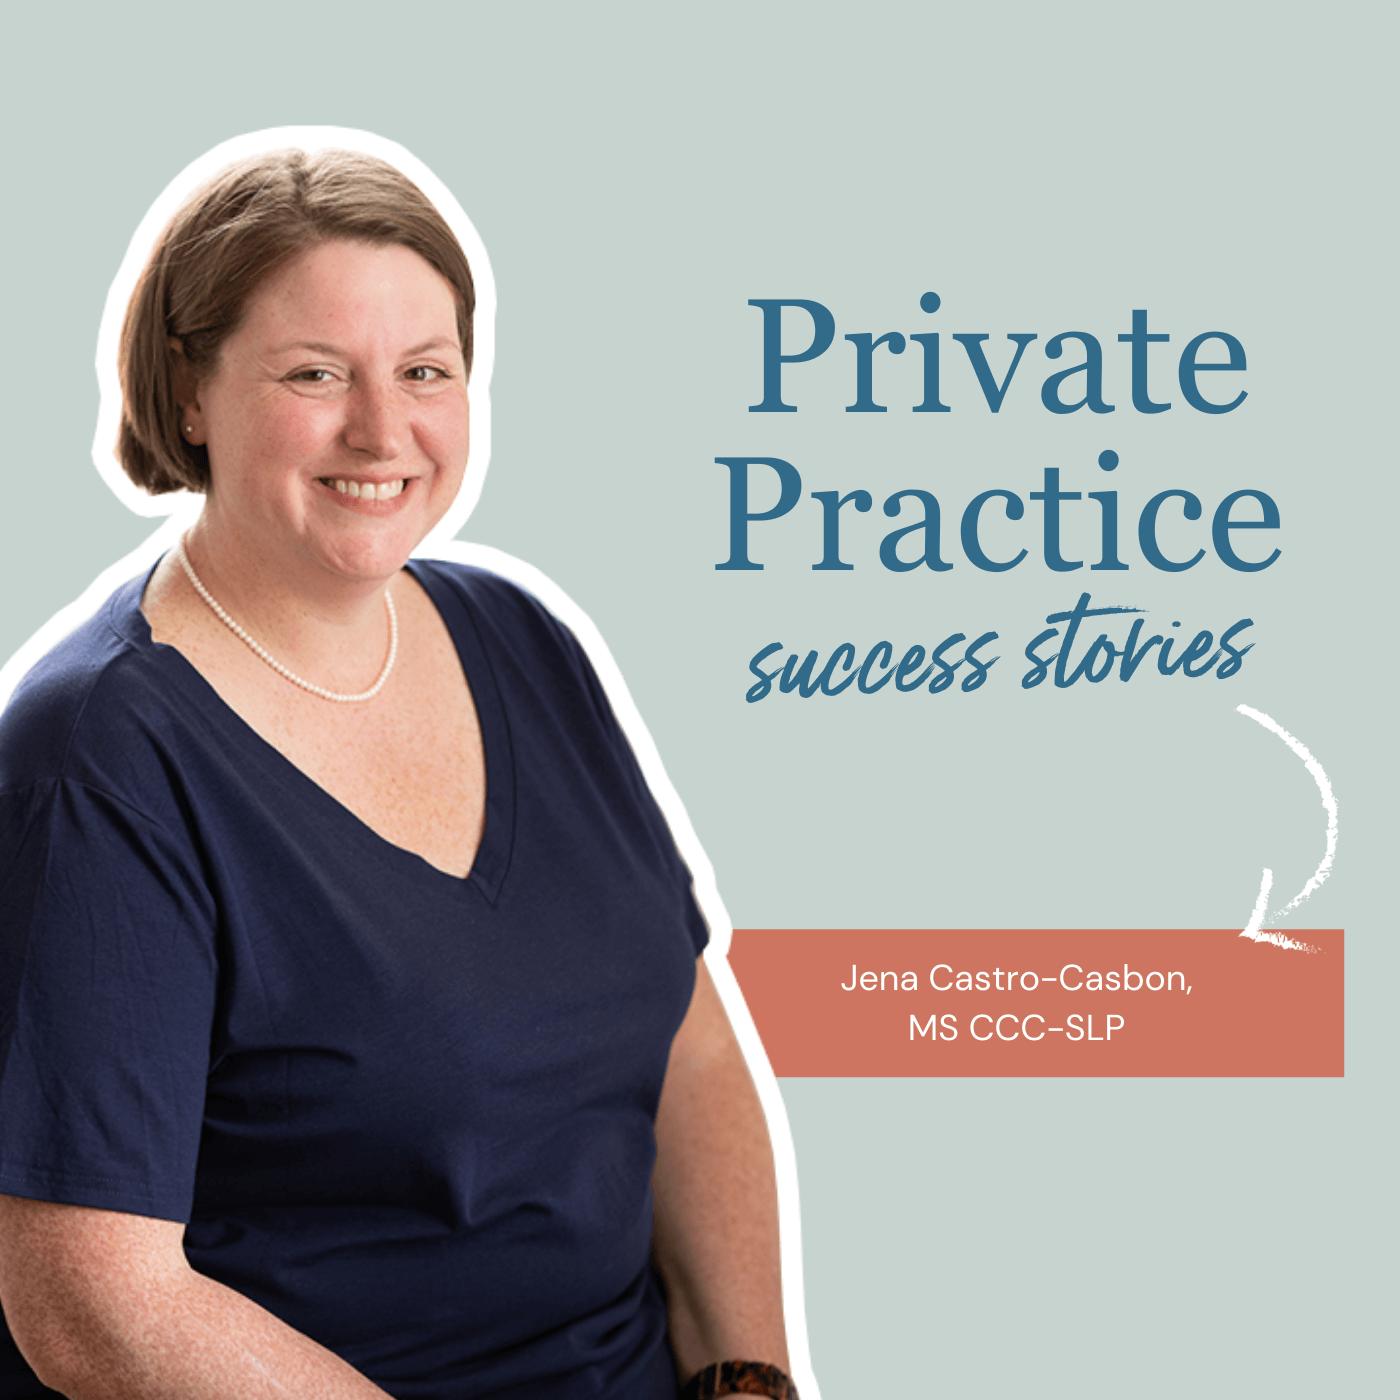 Private Practice (1)